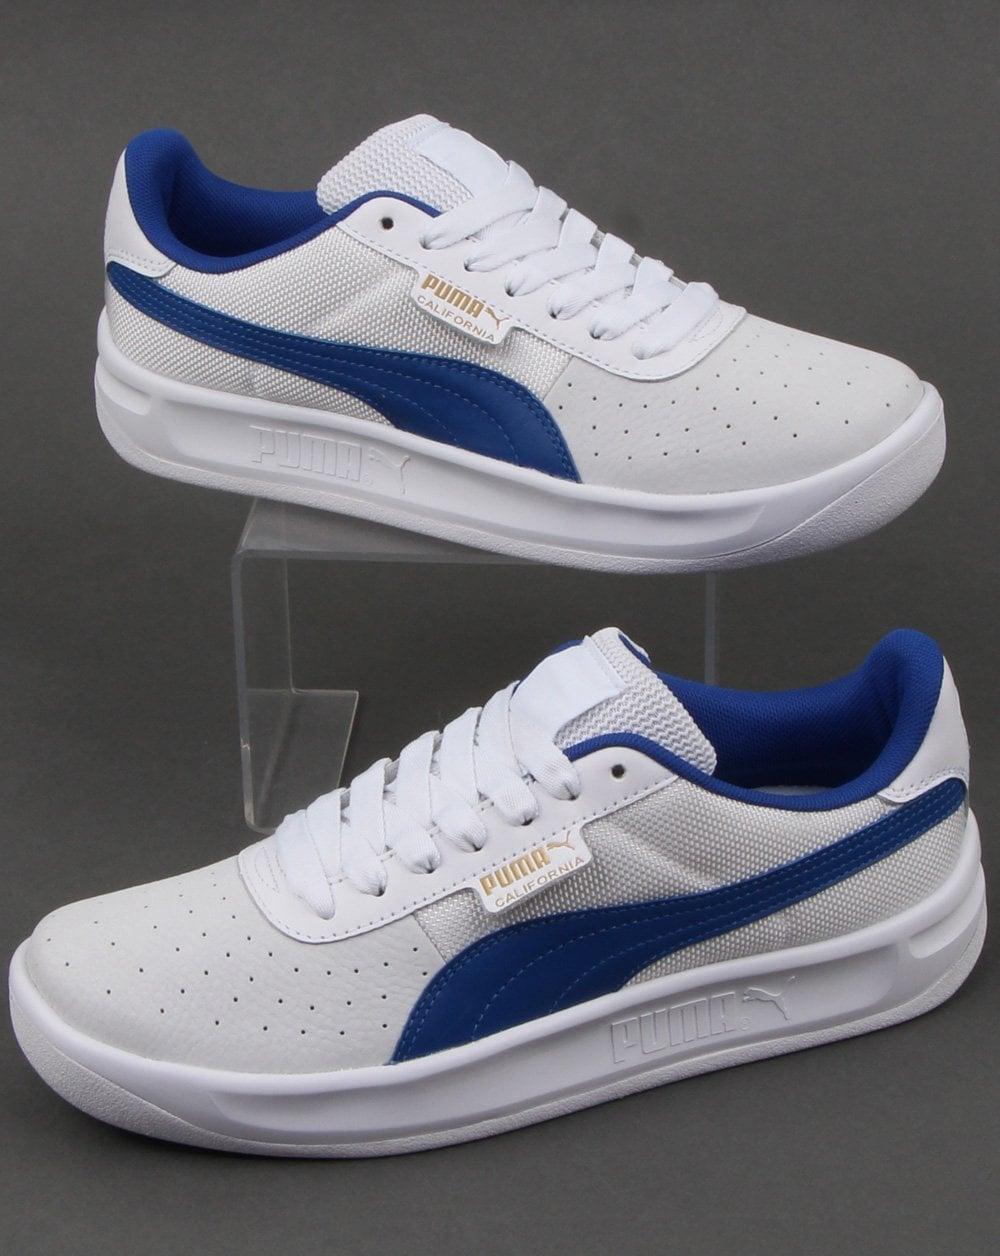 eebe25e389c Puma Puma California Trainer White Blue